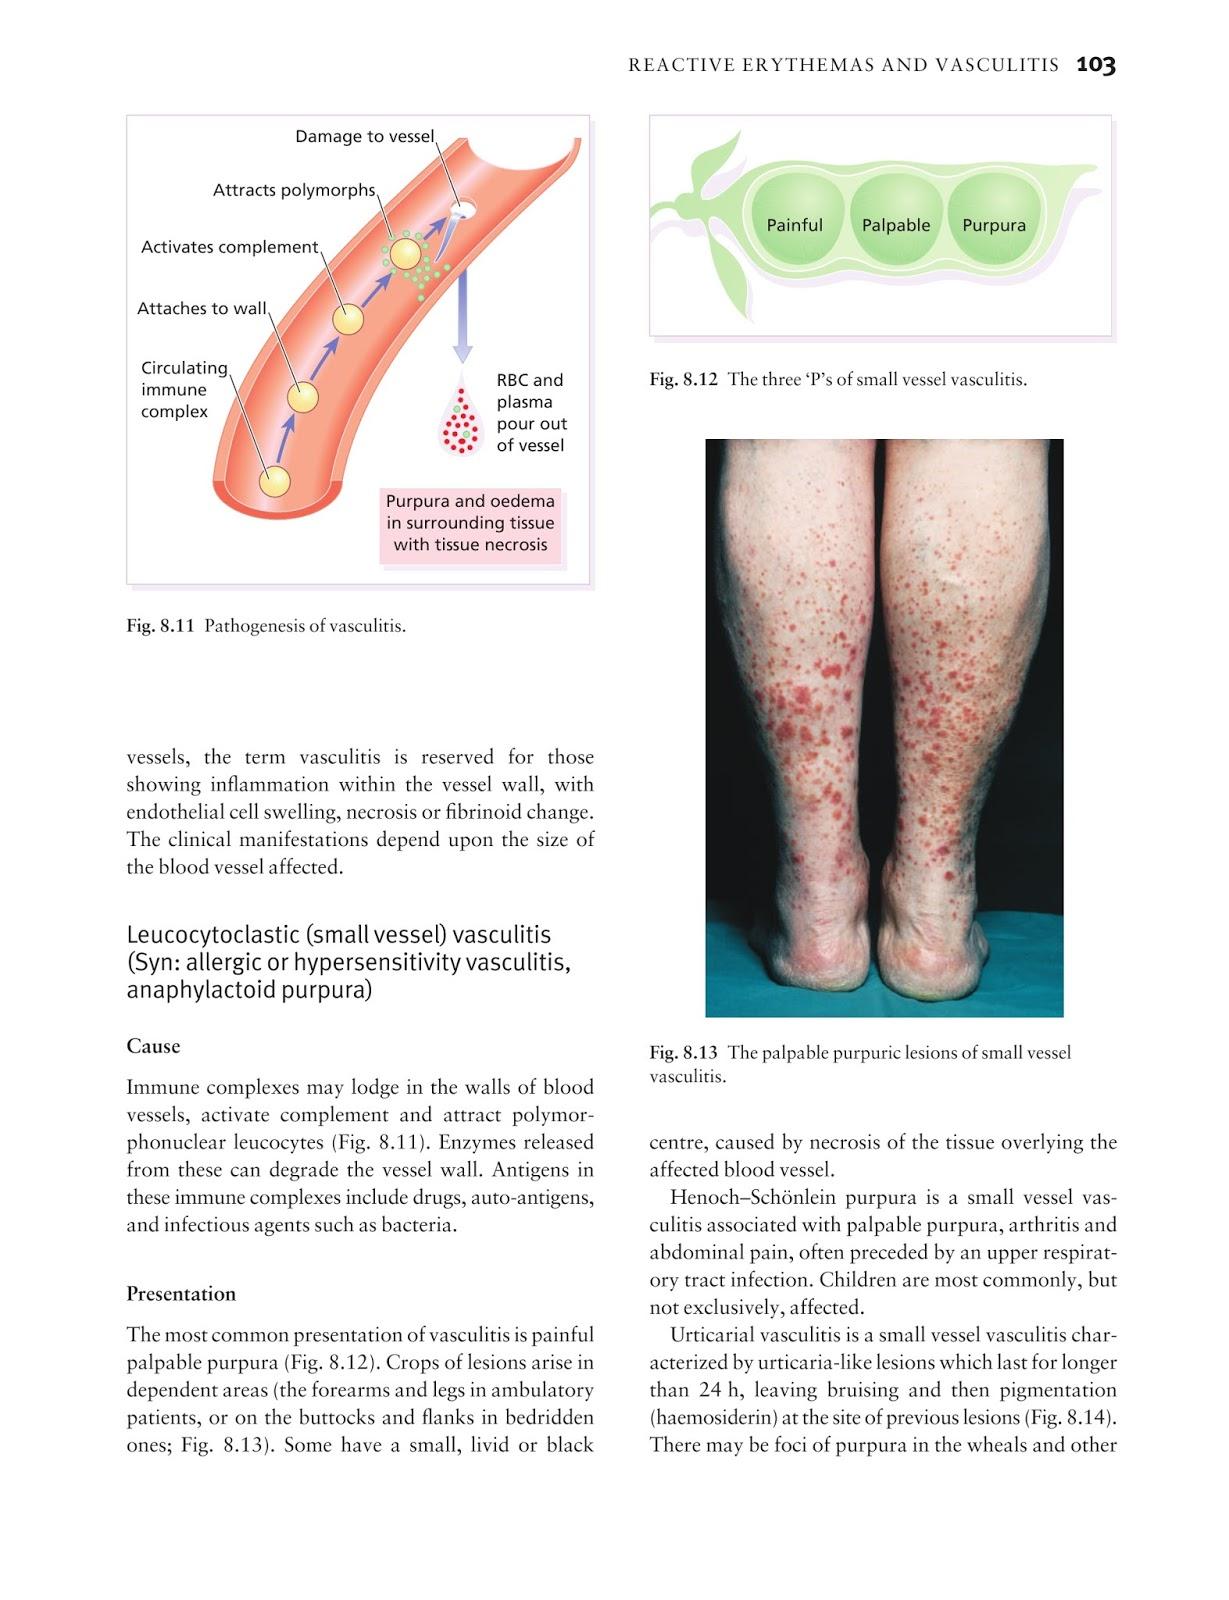 Medicine by Sfakianakis G. Alexandros: Skin disease in